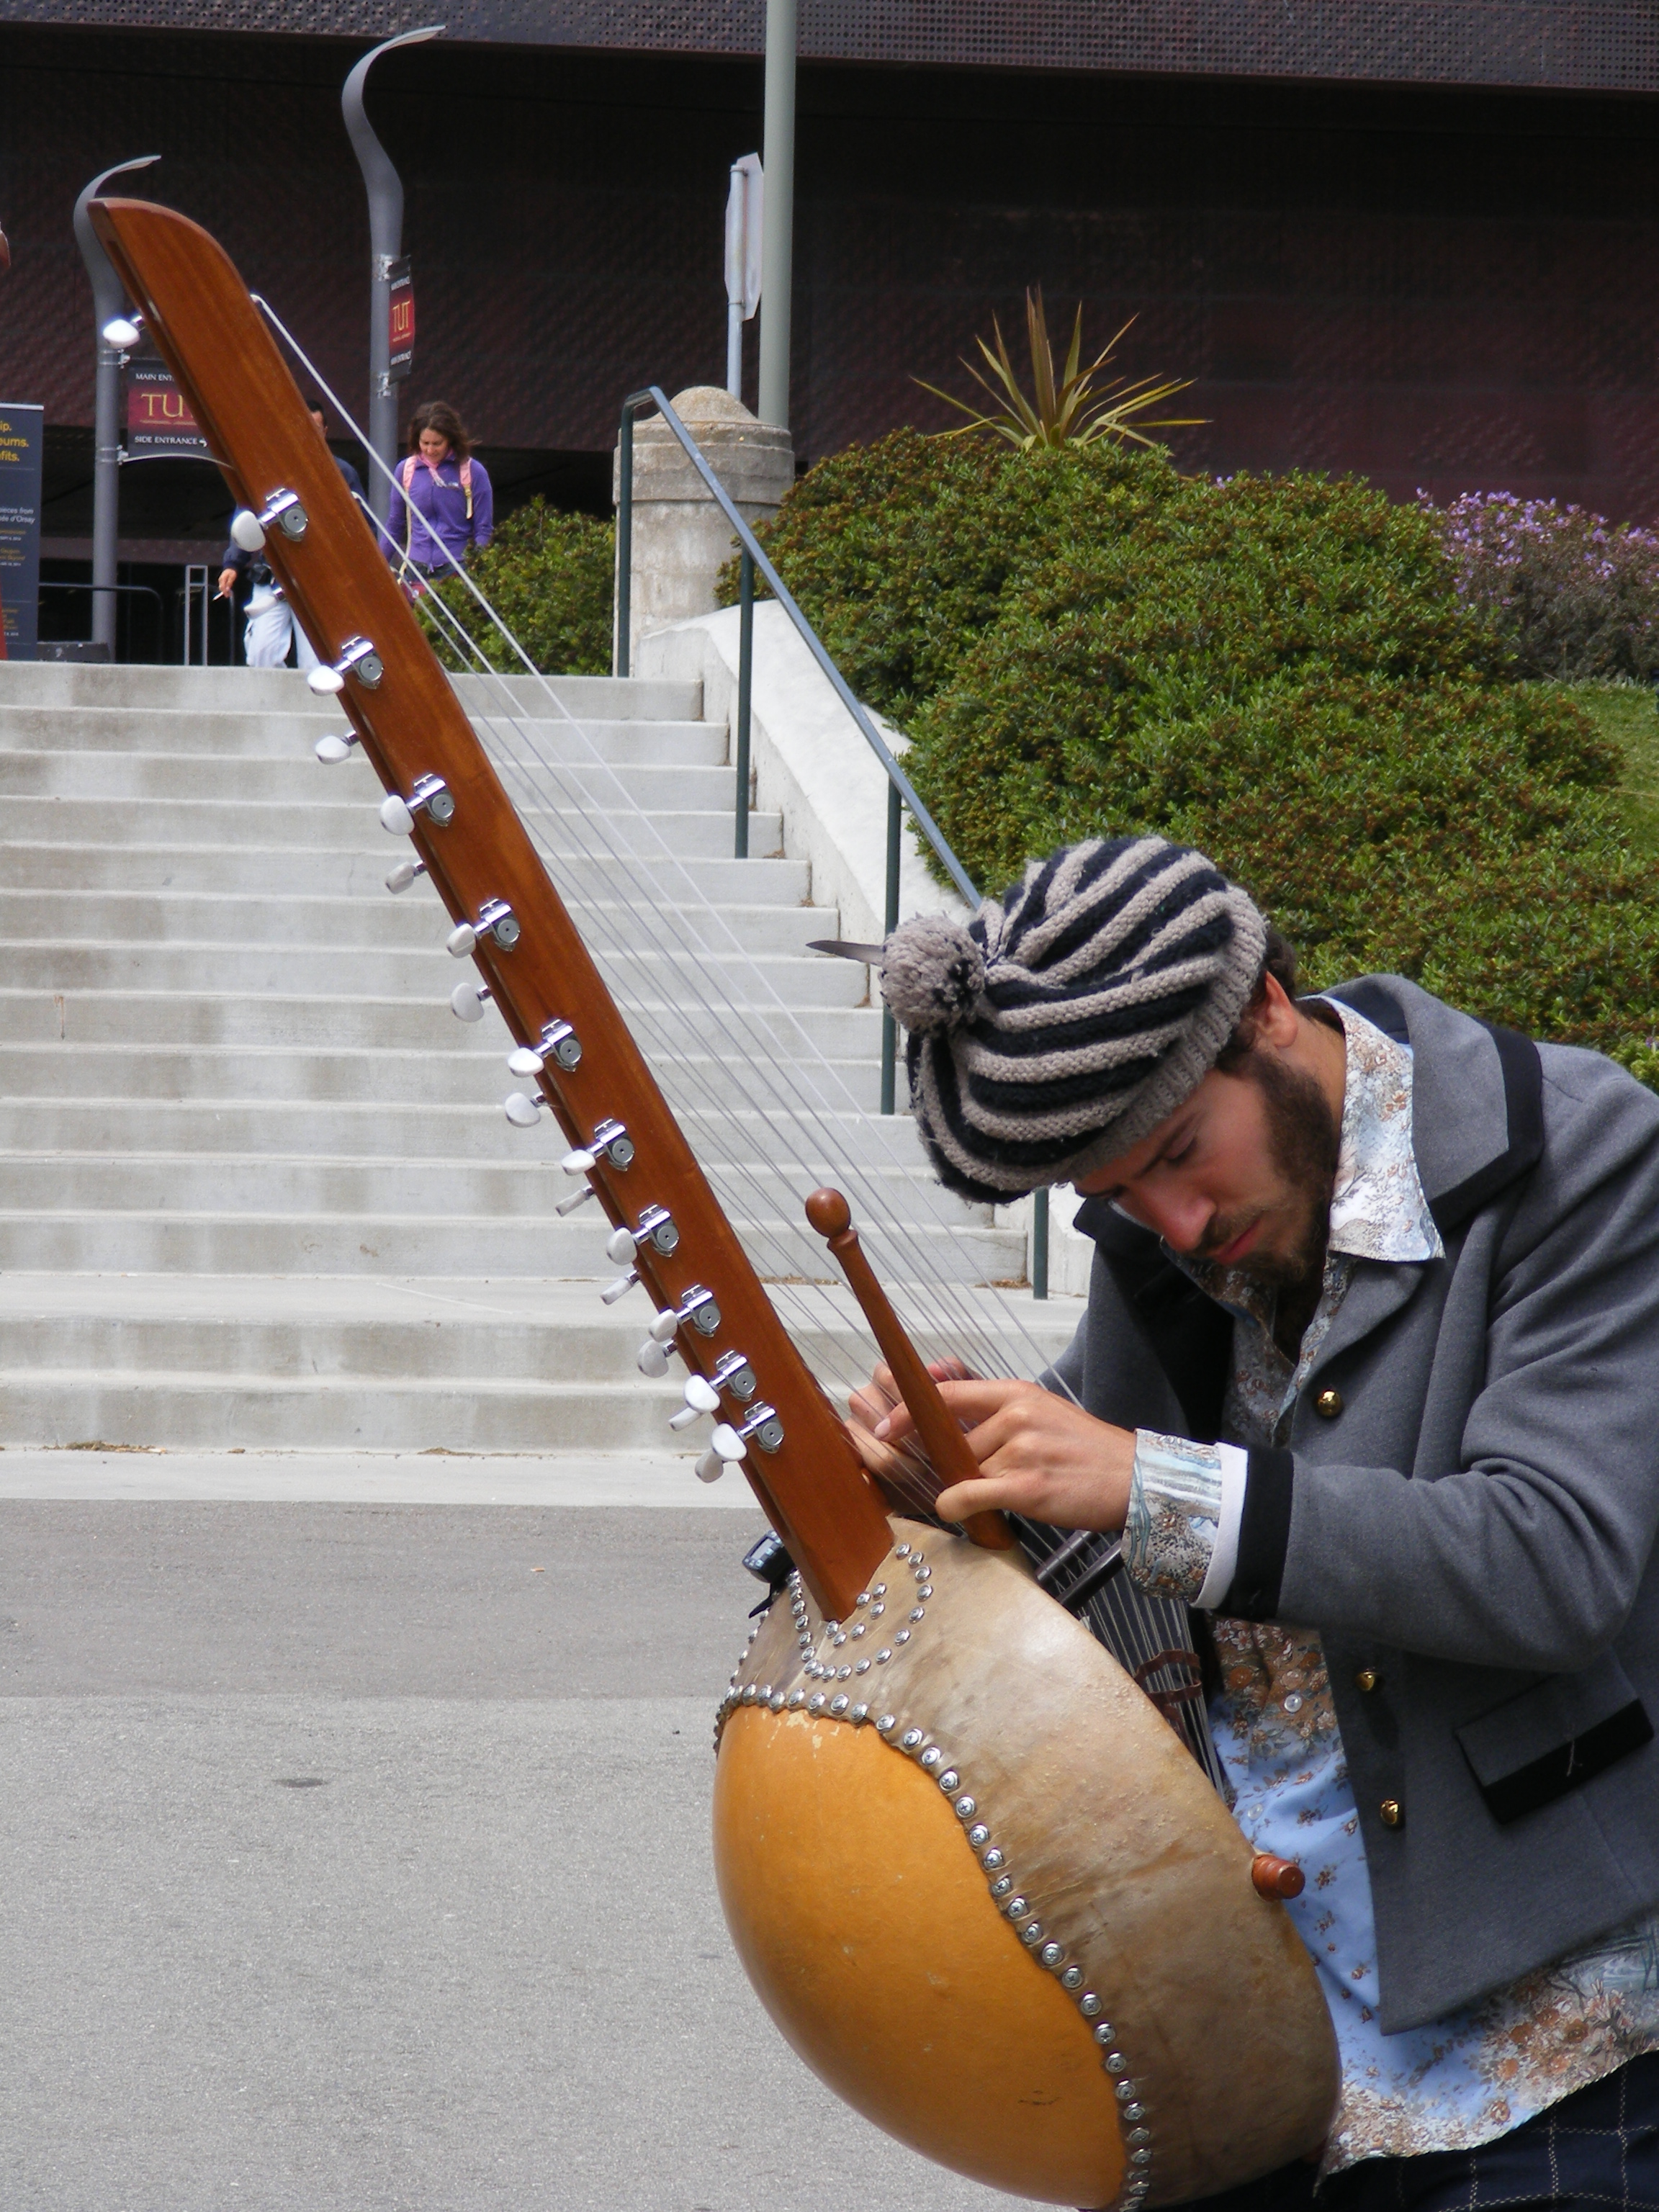 Golden Gate Park, Instrument, Man, Player, Sanfrancisco, HQ Photo